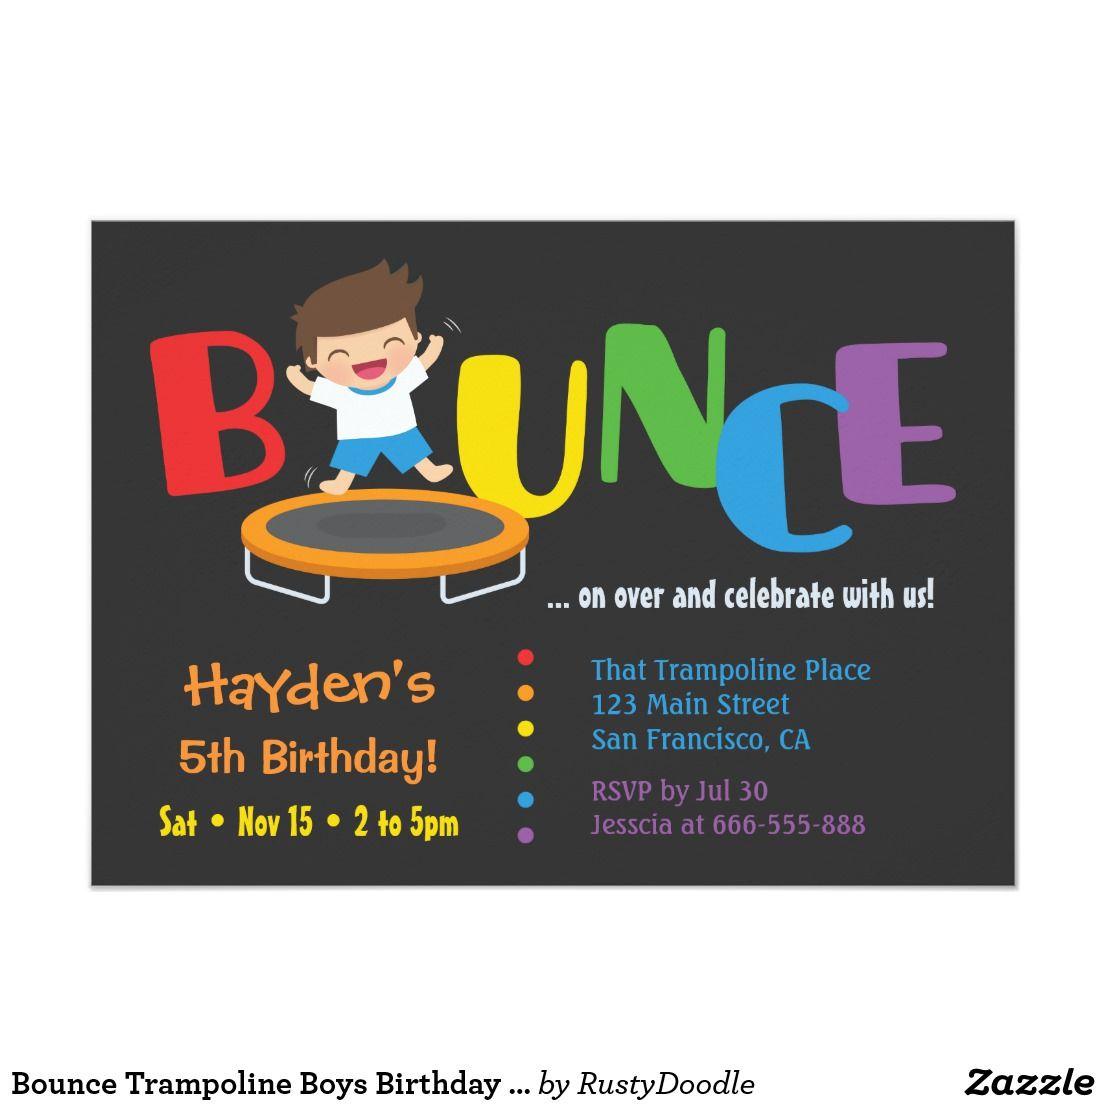 Bounce Trampoline Boys Birthday Party Invitations | Boy birthday ...